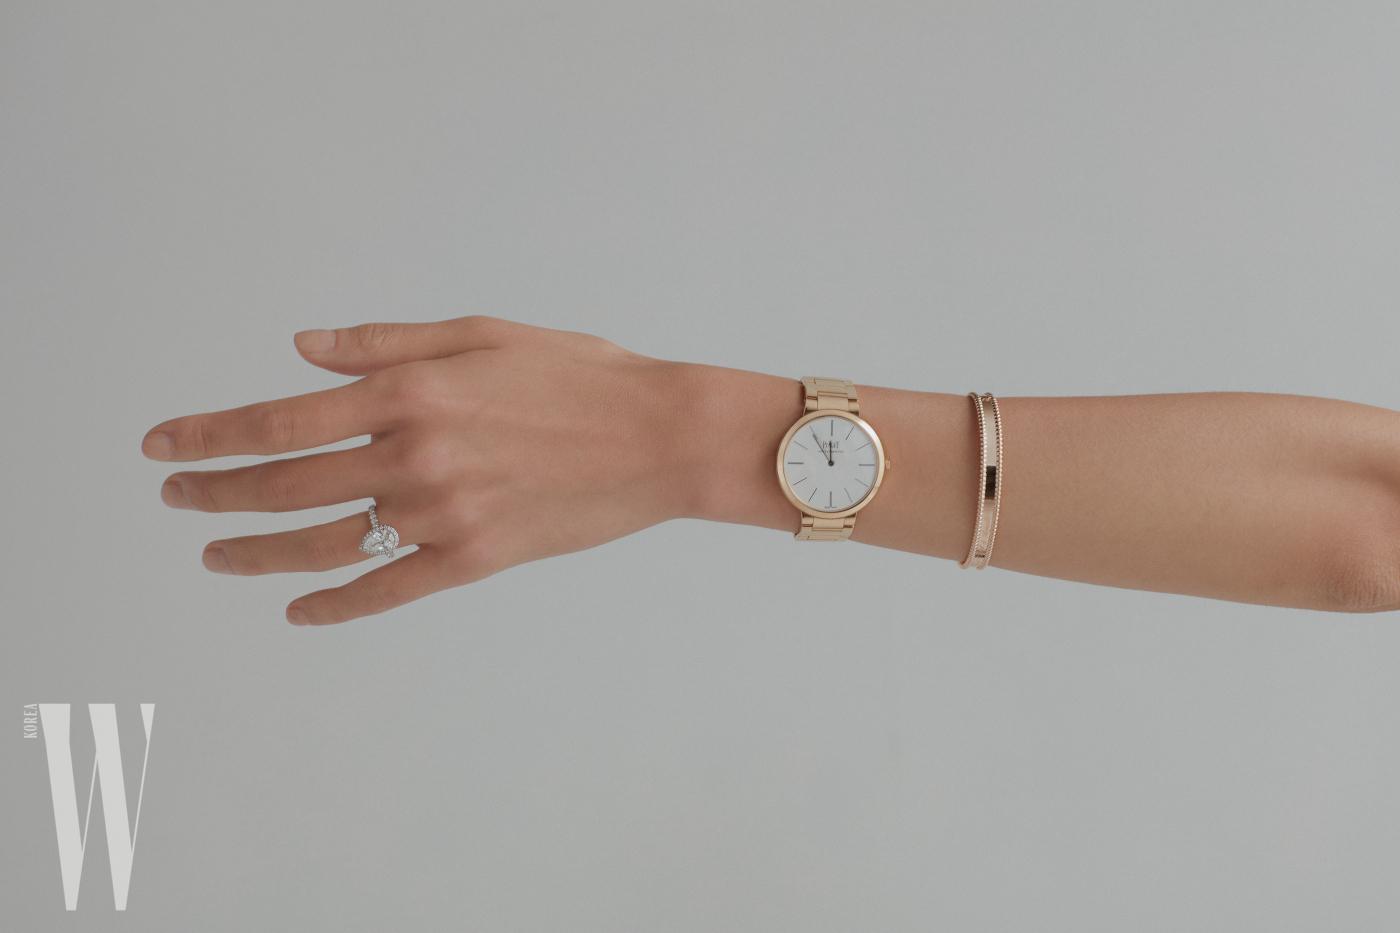 38mm의 큼직한 다이얼과 간결한 디자인이 돋보이는 핑크 골드 알티플라노 시계는 Piaget 제품. 핑크 골드 소재의 빼를리 시그너처 브레이슬릿은 Van Cleef & Arpels 제품. 센터에 2.06캐럿의 페어형 다이아몬드가 볼록하게 솟아 있고, 그 주위를 브릴리언트 컷 다이아몬드가 감싼 매혹적인 자태의 데스티네 솔리테어 링은 Cartier 제품.